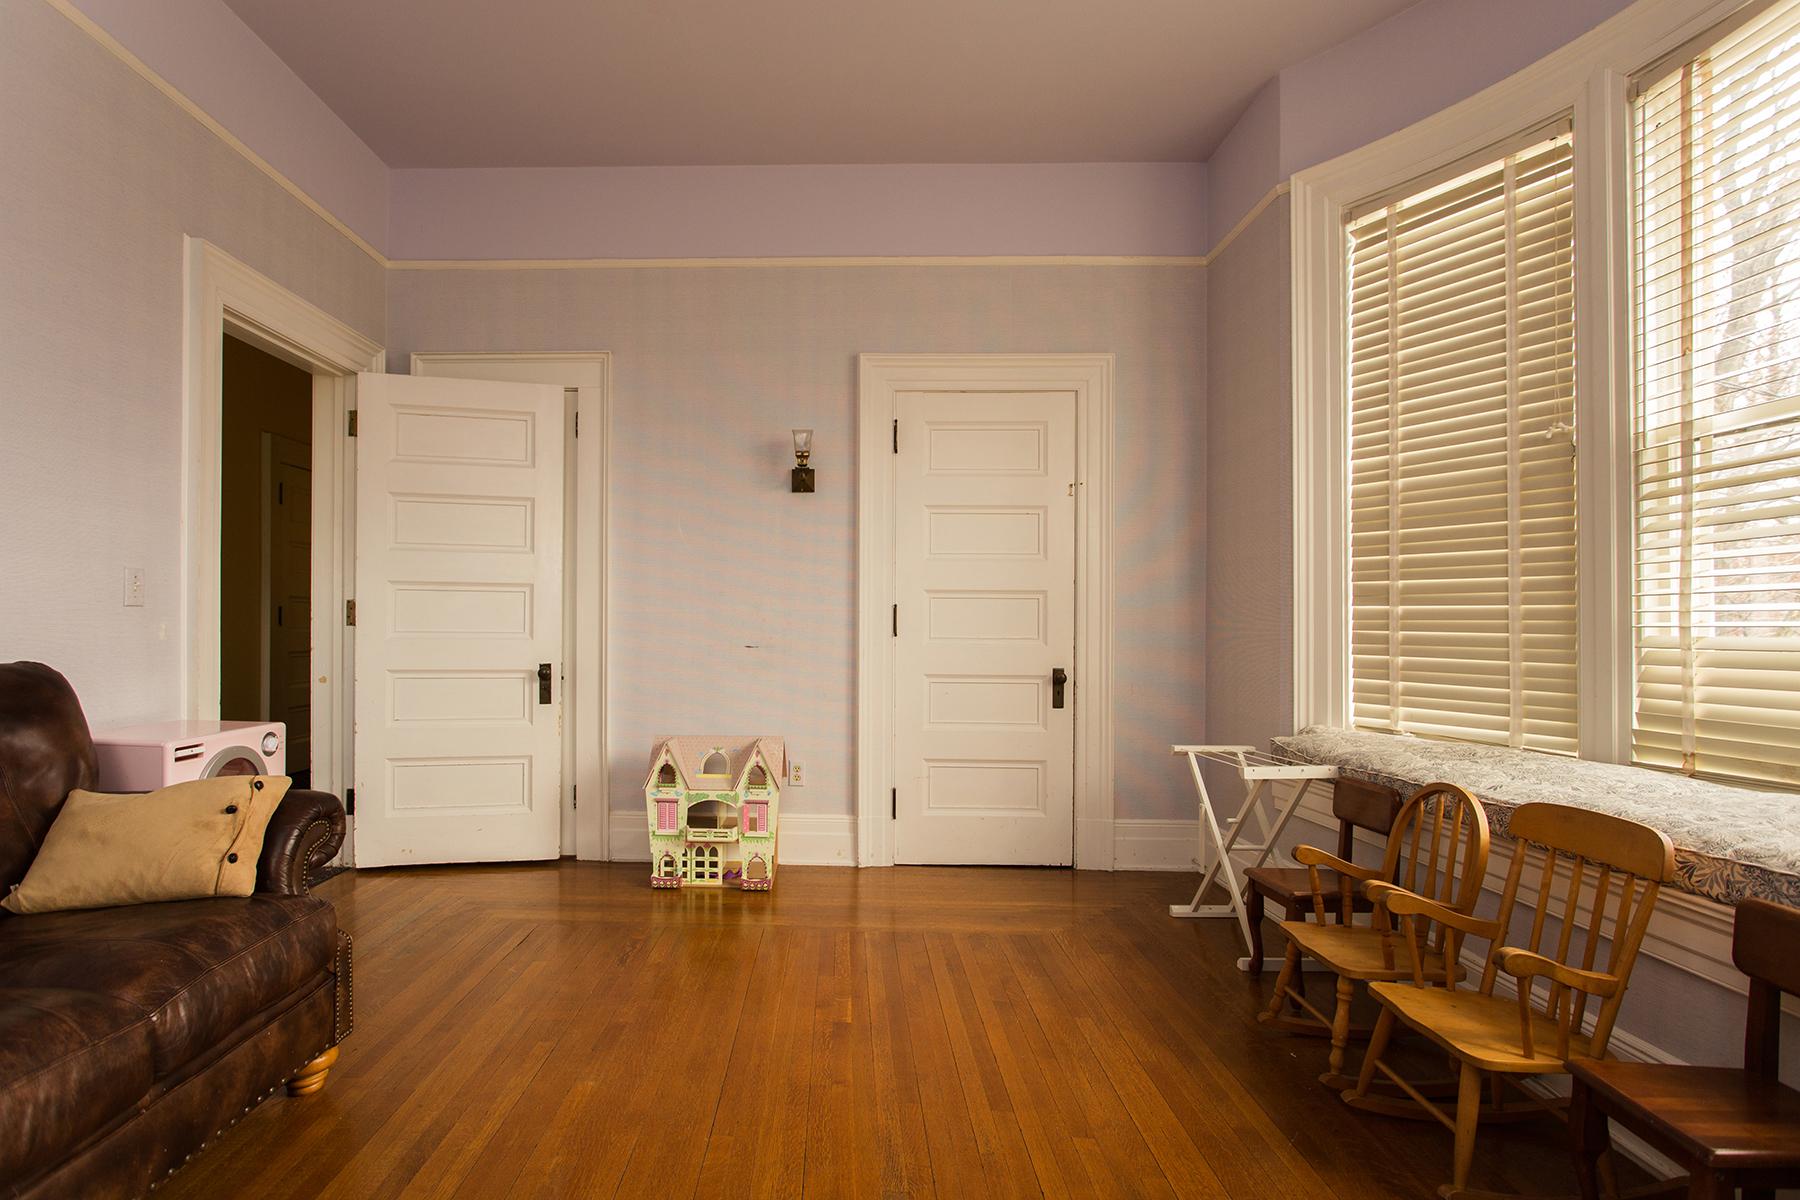 Additional photo for property listing at Downtown Saratoga Victorian Mansion 115  Circular St 萨拉托贾斯普林斯, 纽约州 12866 美国